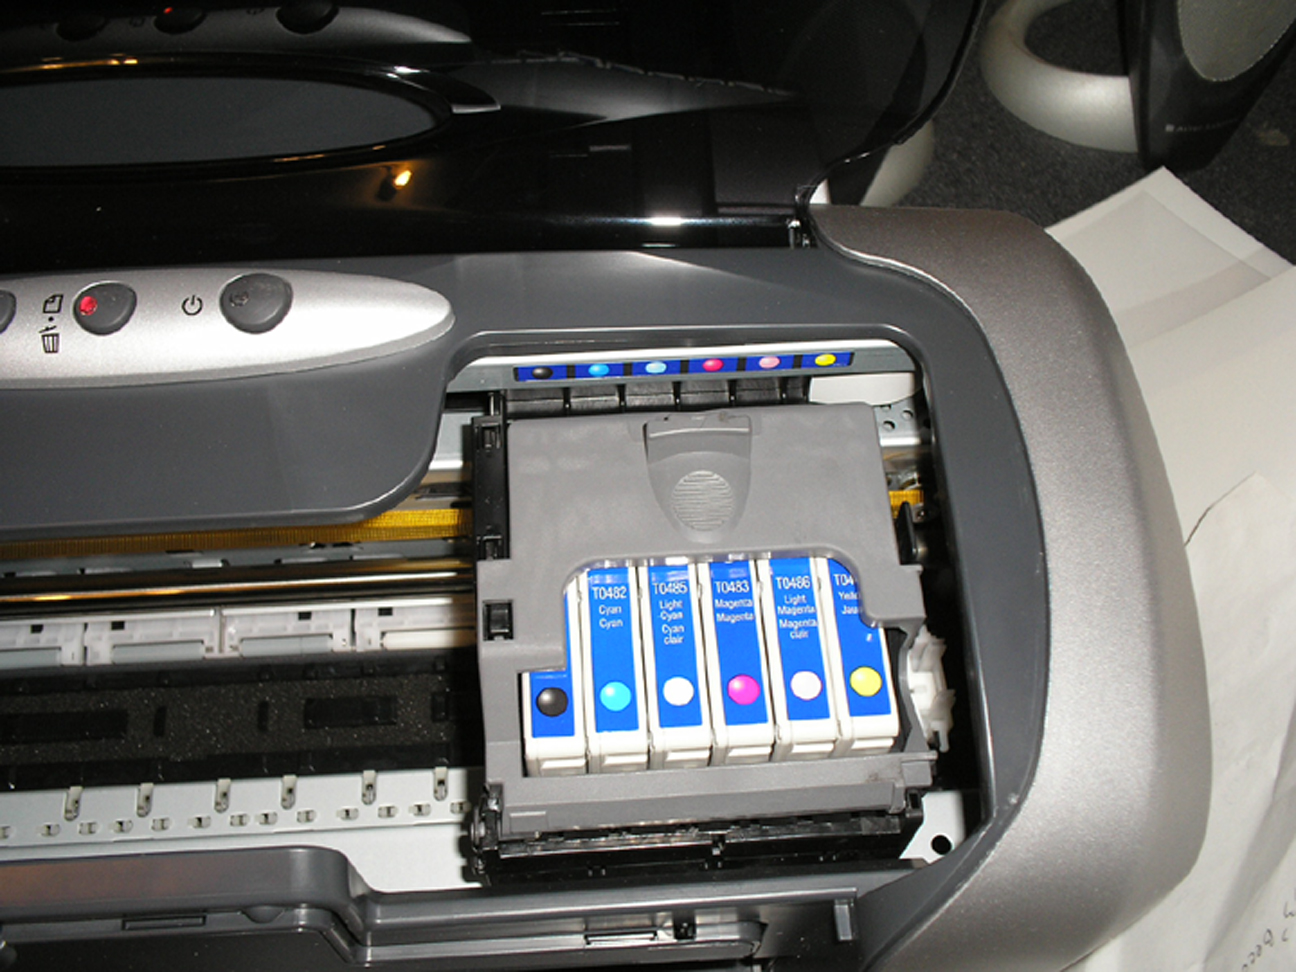 Epson R200 Printer Driver